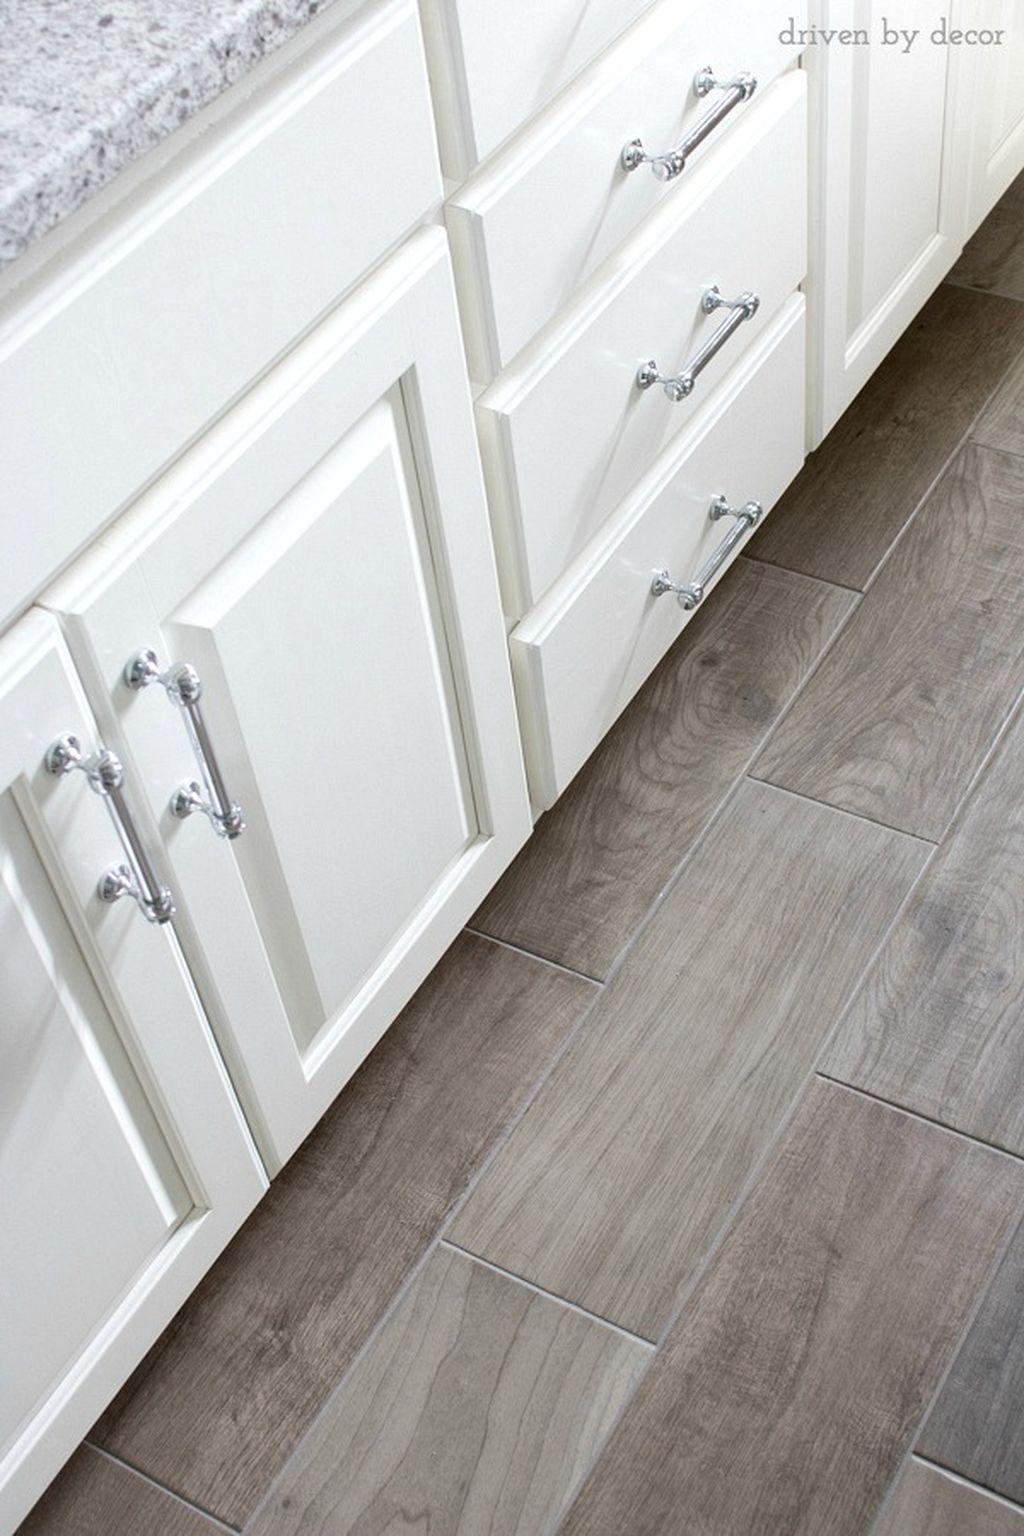 40 outstanding porcelain tile kitchen floors ideas kitchen 40 outstanding porcelain tile kitchen floors ideas doublecrazyfo Gallery